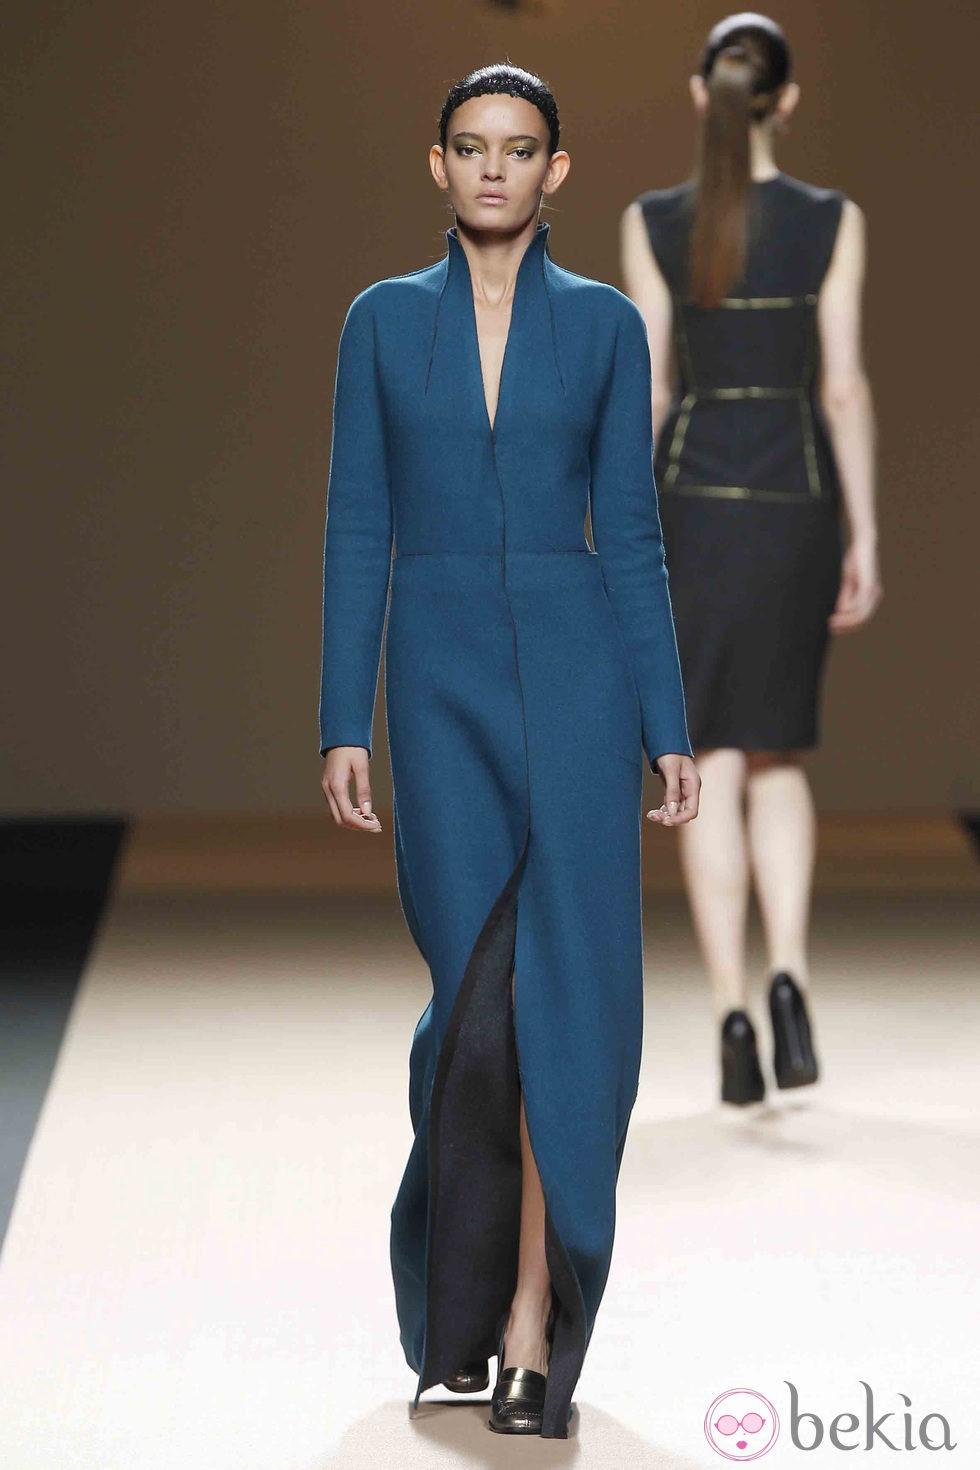 anterior desfile de jesus del pozo en la fashion week madrid vestido largo en tono azul